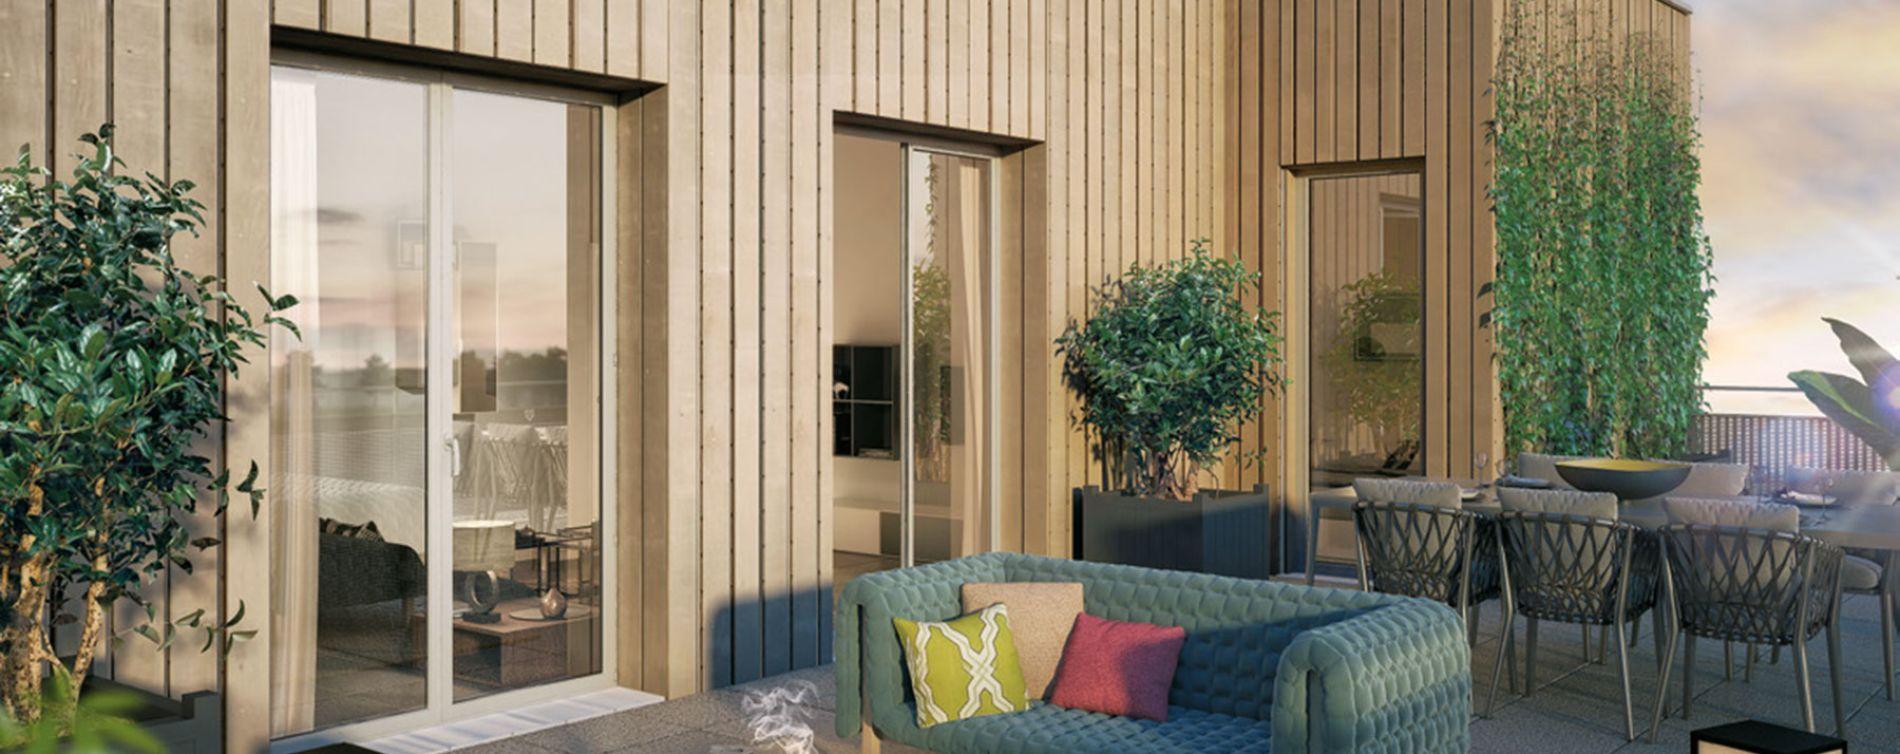 Nort-sur-Erdre : programme immobilier neuve « Coeur Bocage » (2)